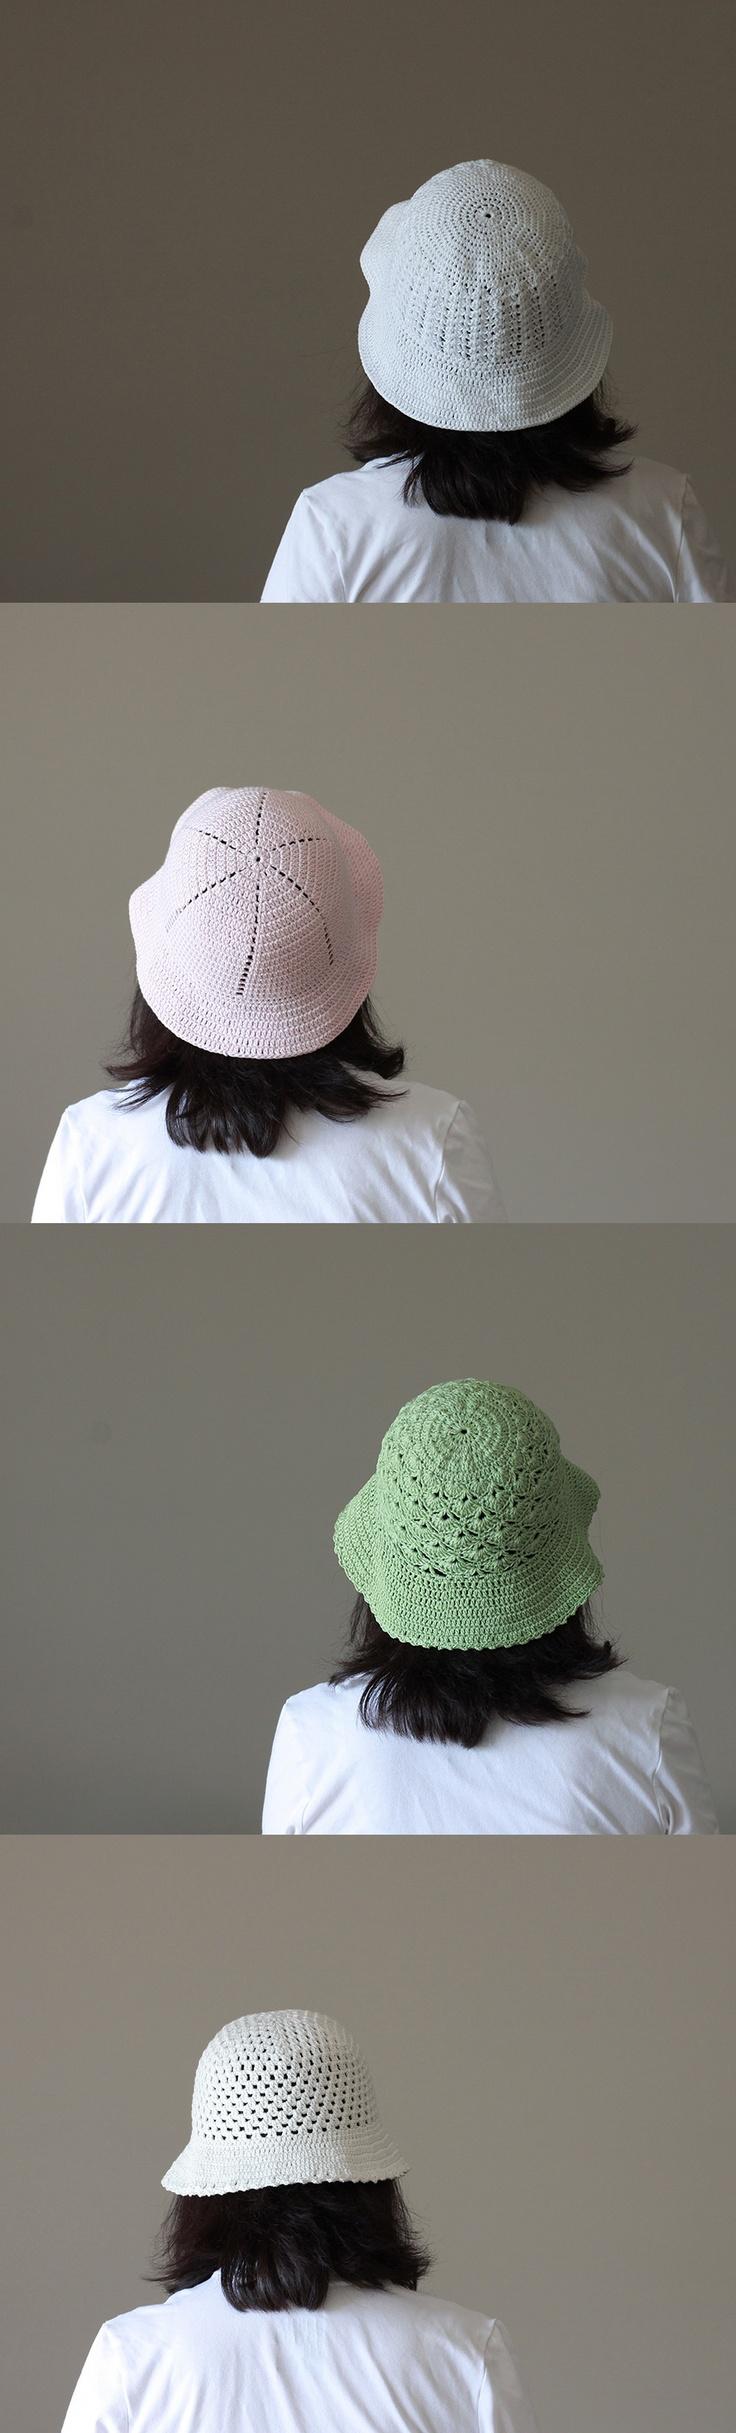 Crochet Summer Hat for Women made with 100% mercerized cotton yarn, $33 #summer hat #cotton hat #gift for mom #green #crochet hat